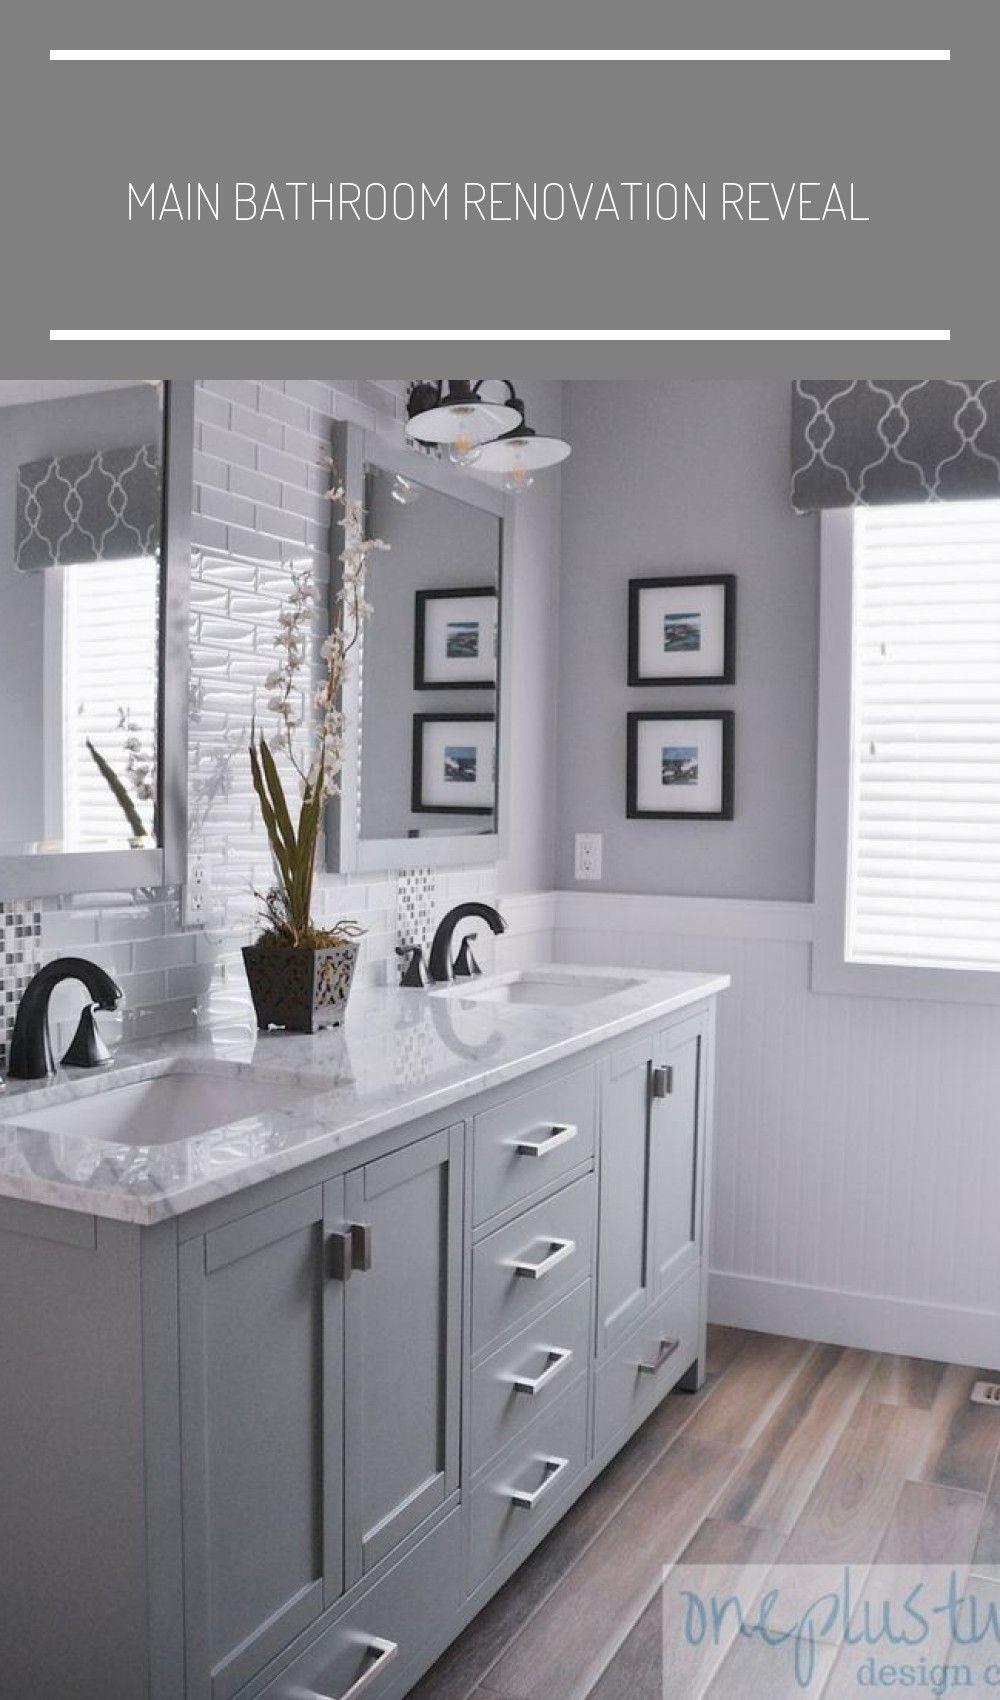 Main Bathroom Renovation Revea I 2020